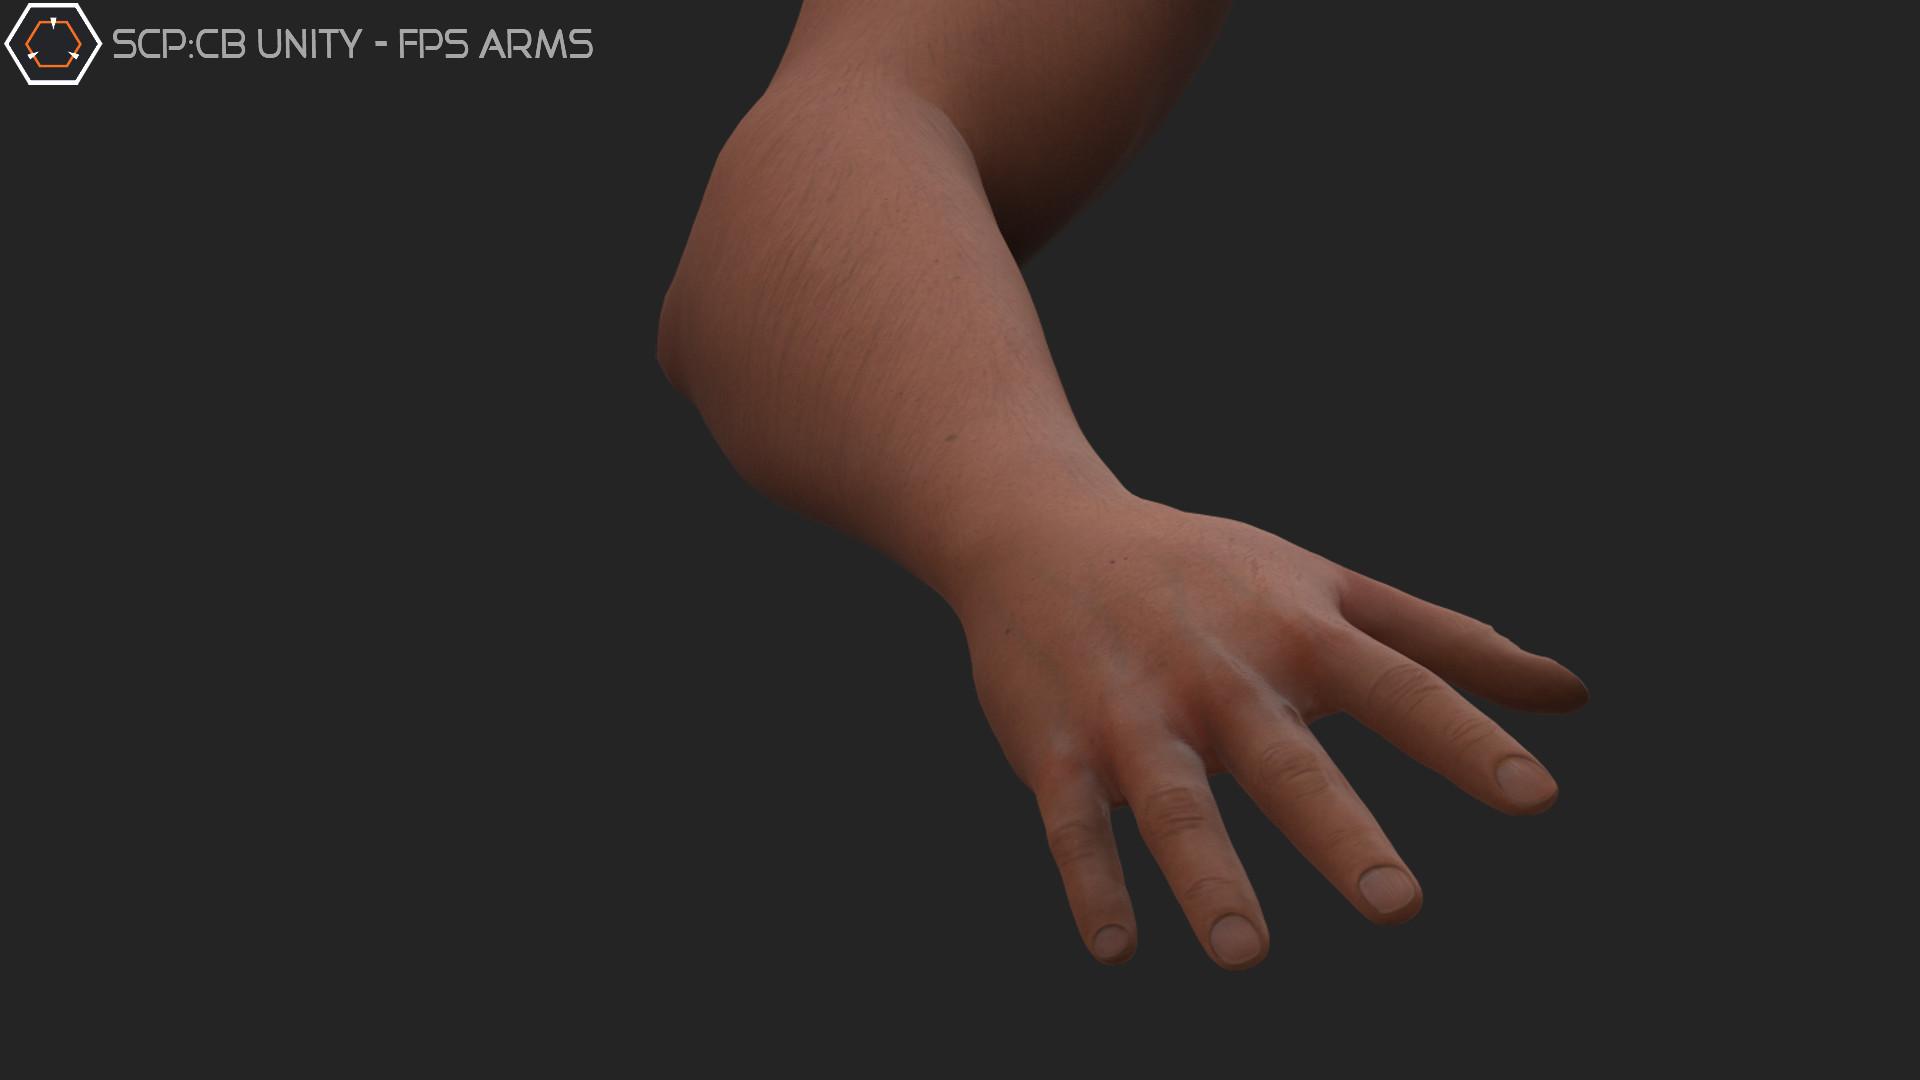 ArtStation - SCP:CB - Unity Fps Arms, Aidan Eldred